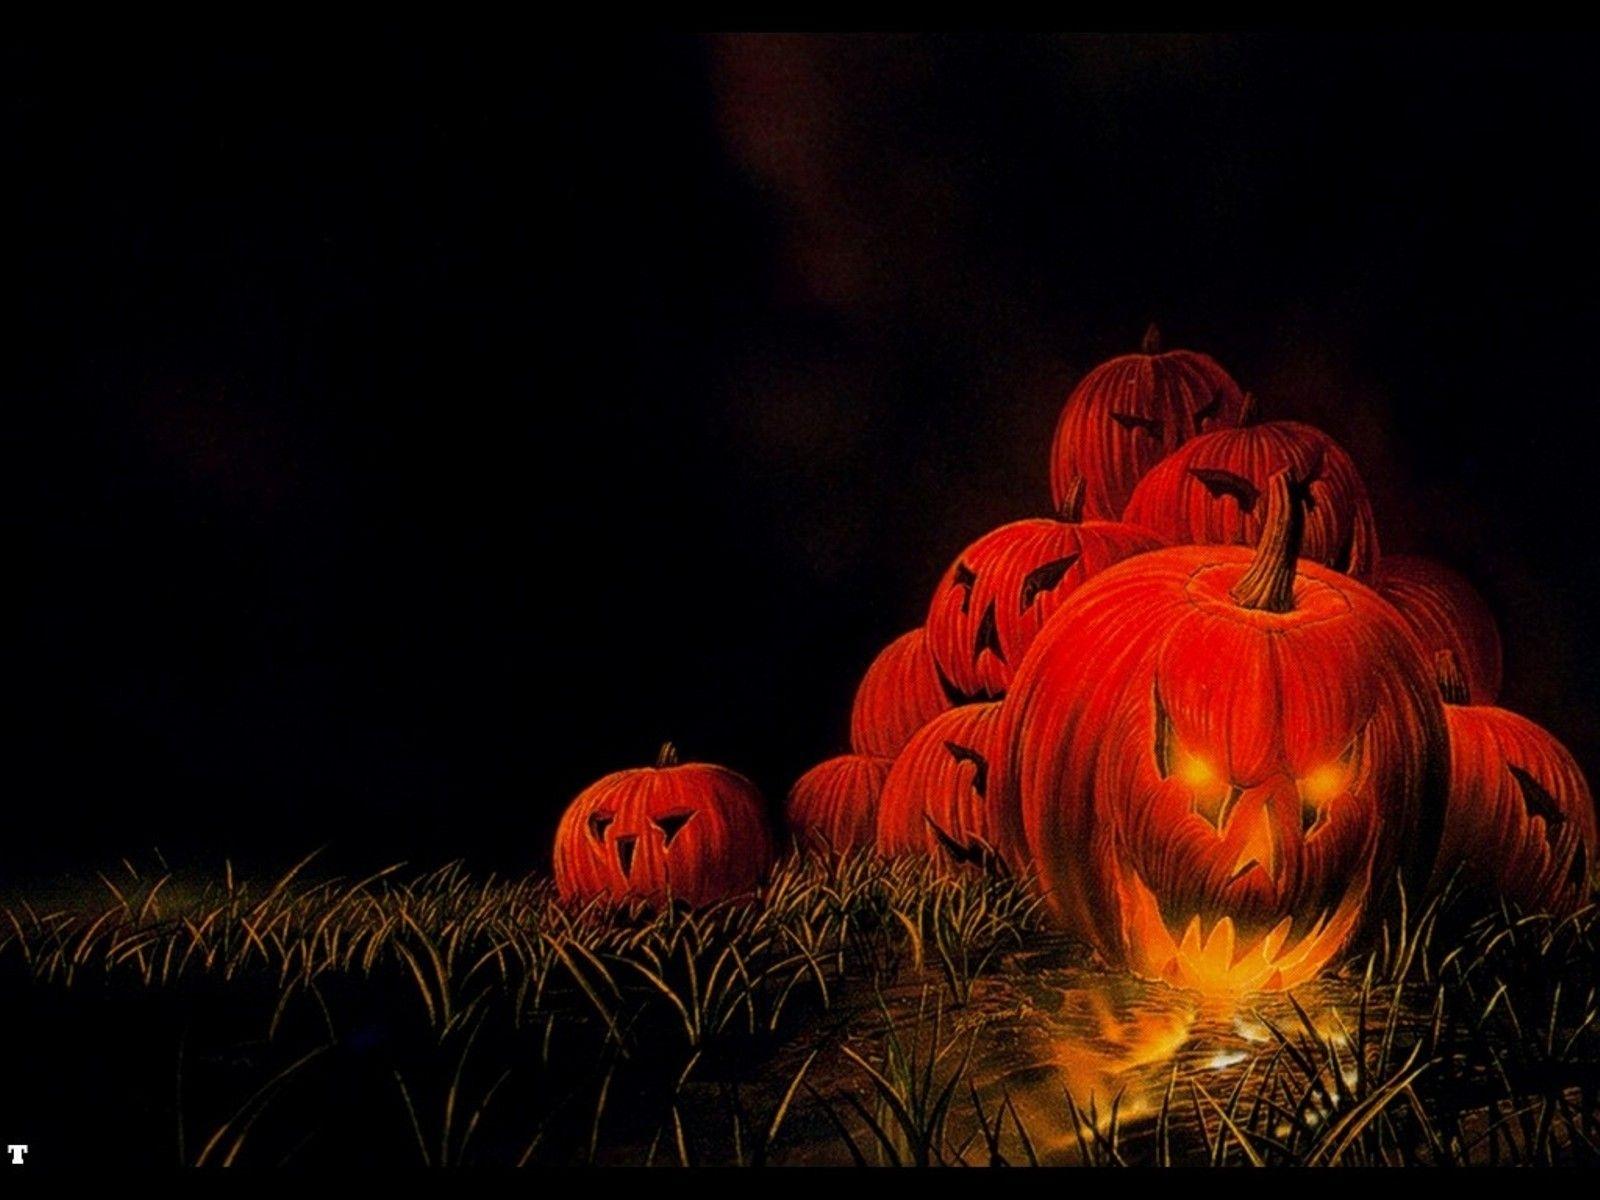 creepy halloween wallpapers   all hallow's eve   pinterest   creepy